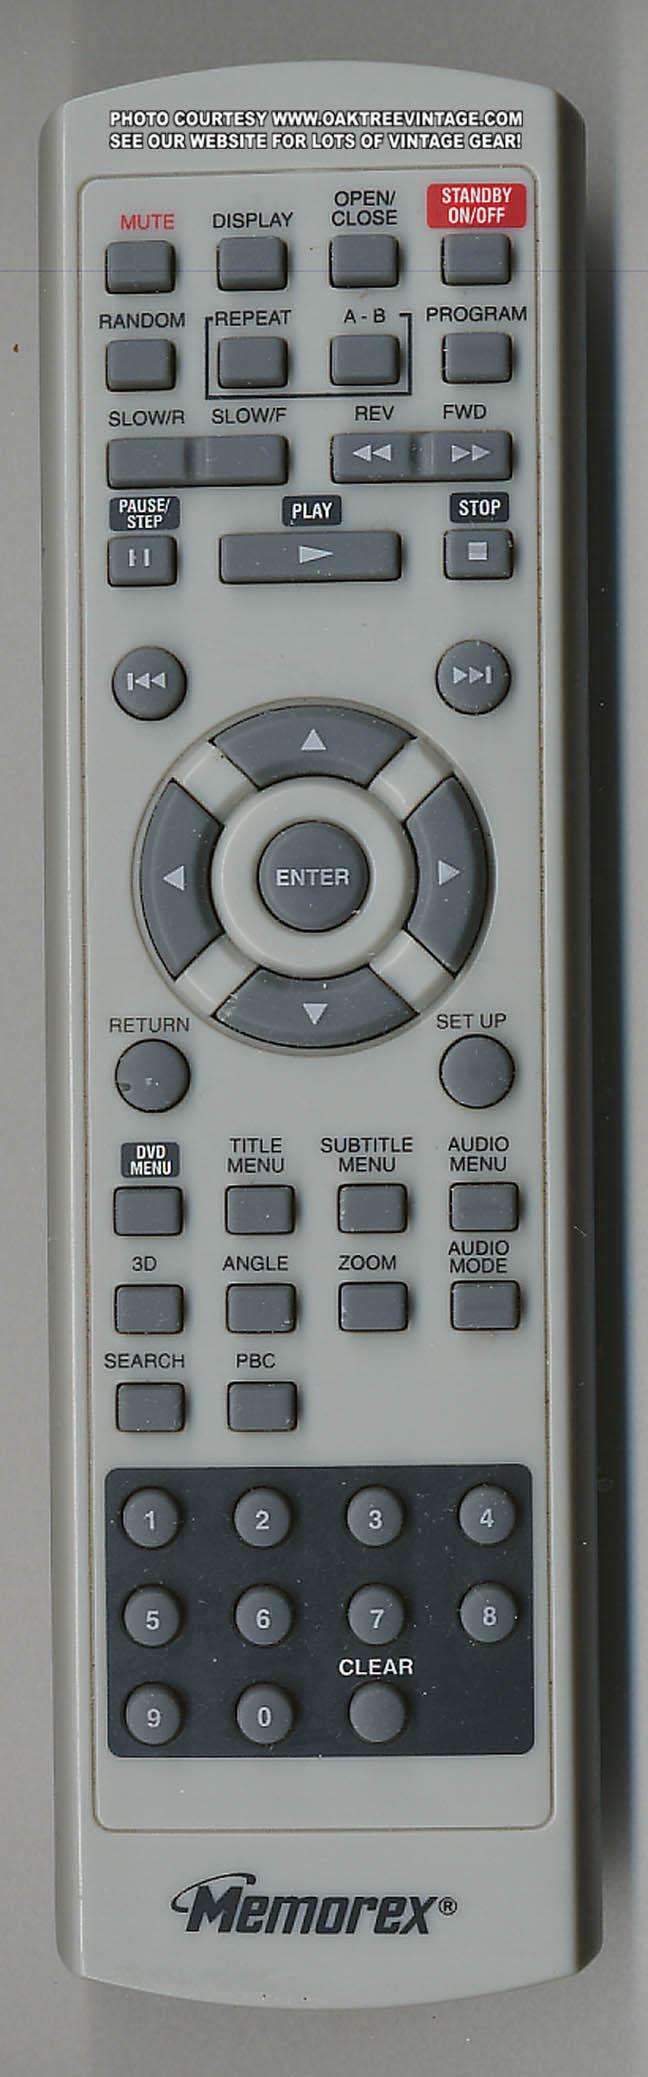 Memorex dvd player remote not working